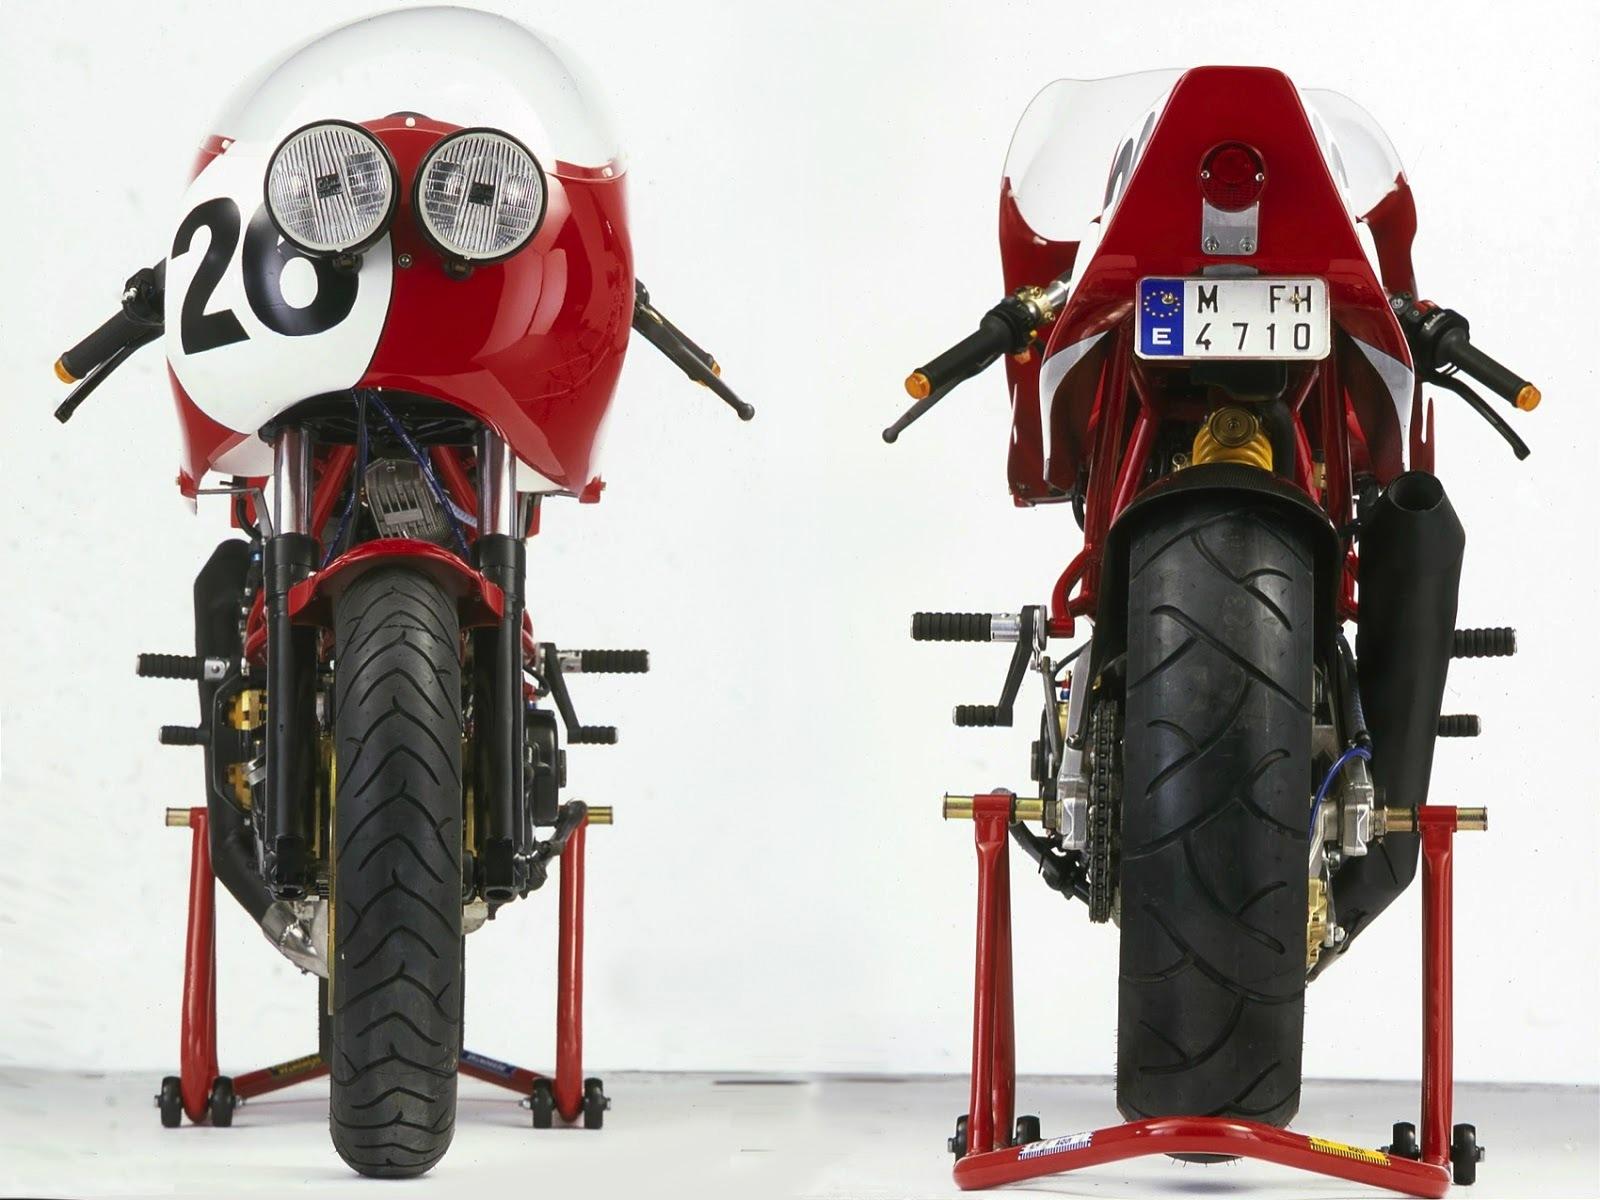 Racer, Oldies, naked ... TOPIC n°3 SUPERPANTAH%2B900%2B